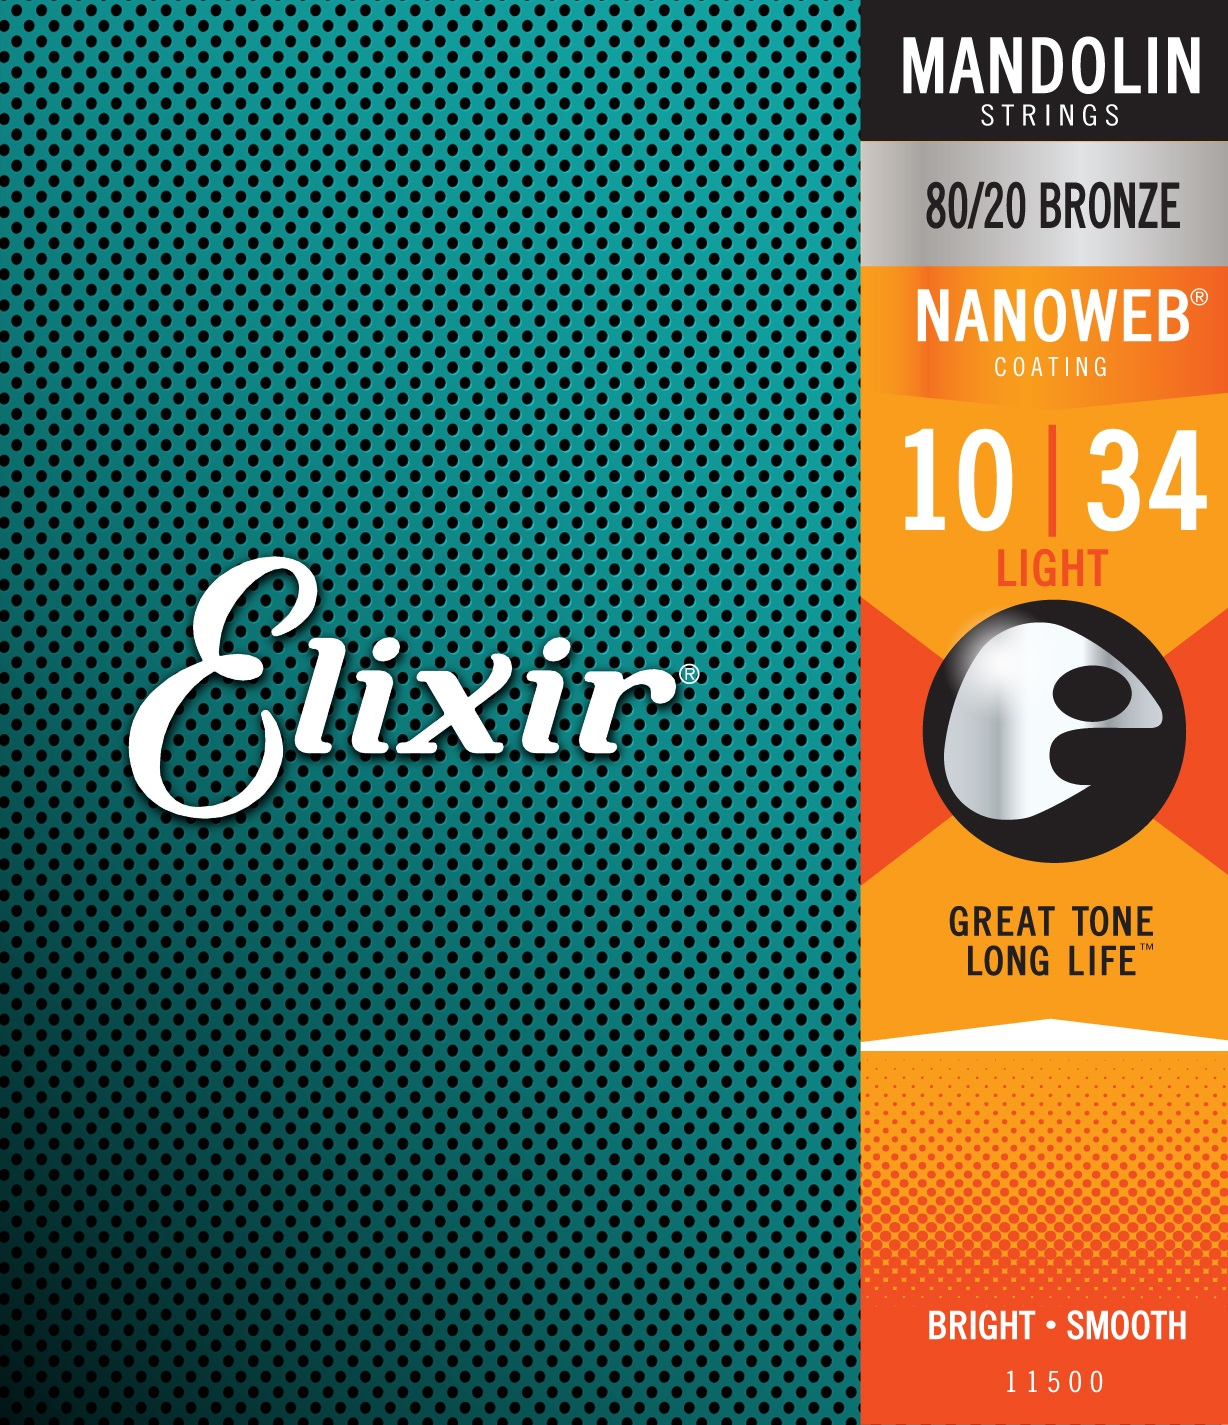 Elixir Nanoweb 80/20 Bronze Mandolin Light